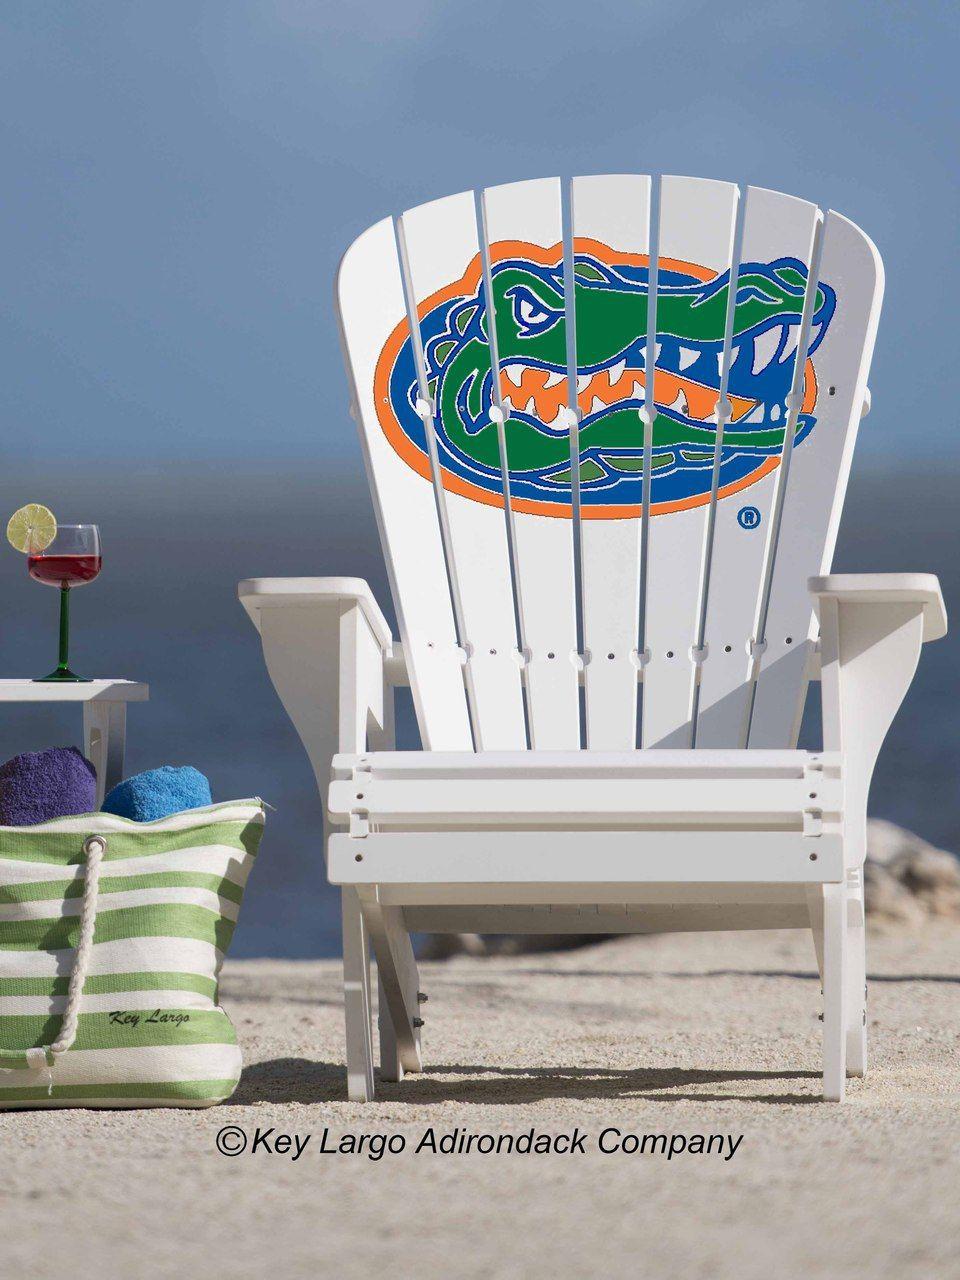 University Of Florida Gators Adirondack Chair Outdoor Chairs